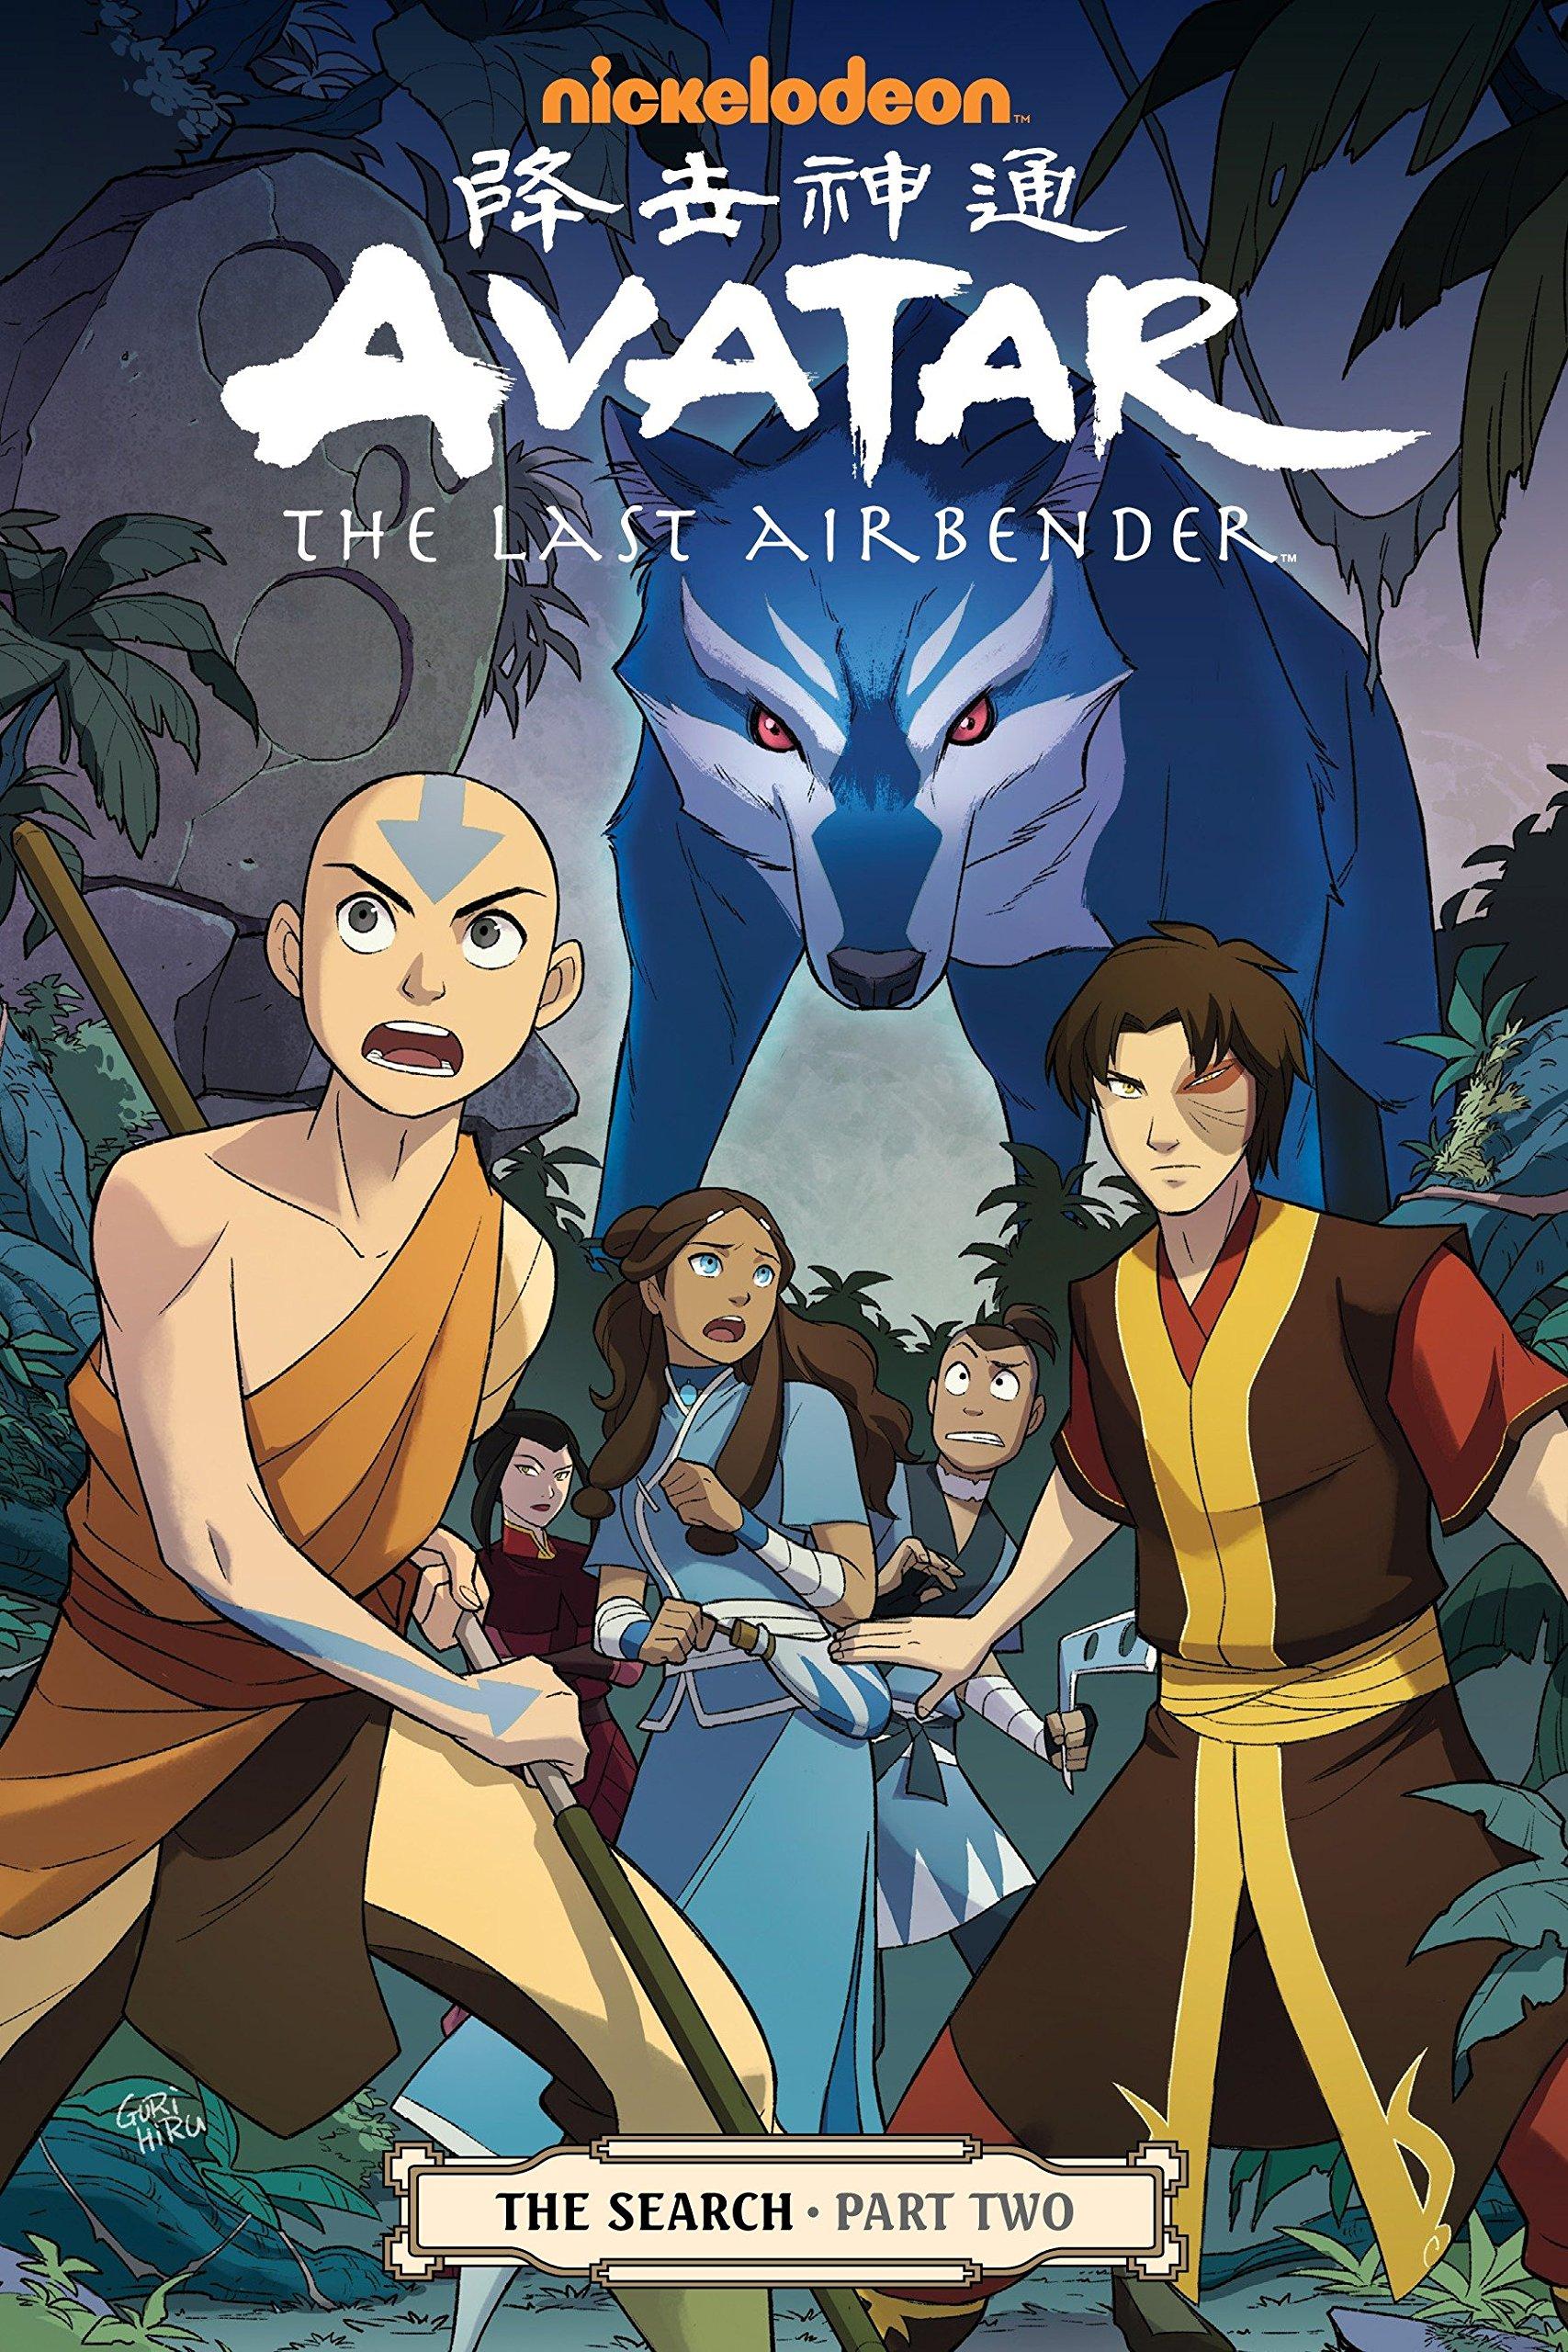 Avatar: The Last Airbender: The Search, Part 2 Paperback – July 23, 2013 Gene Luen Yang Michael Dante DiMartino Bryan Konietzko Dave Marshall